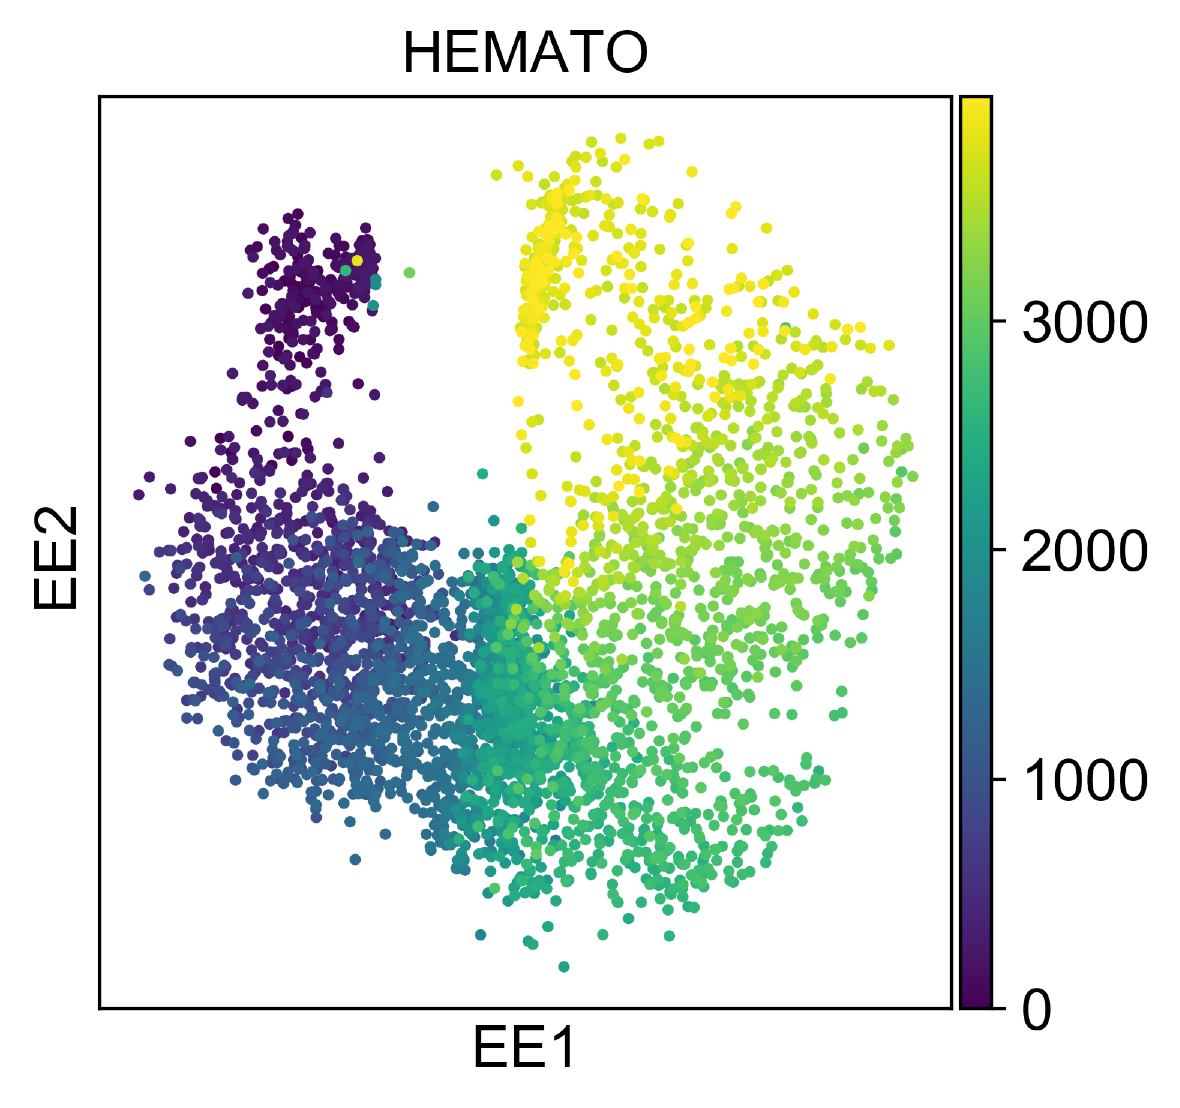 EE of HEMATO